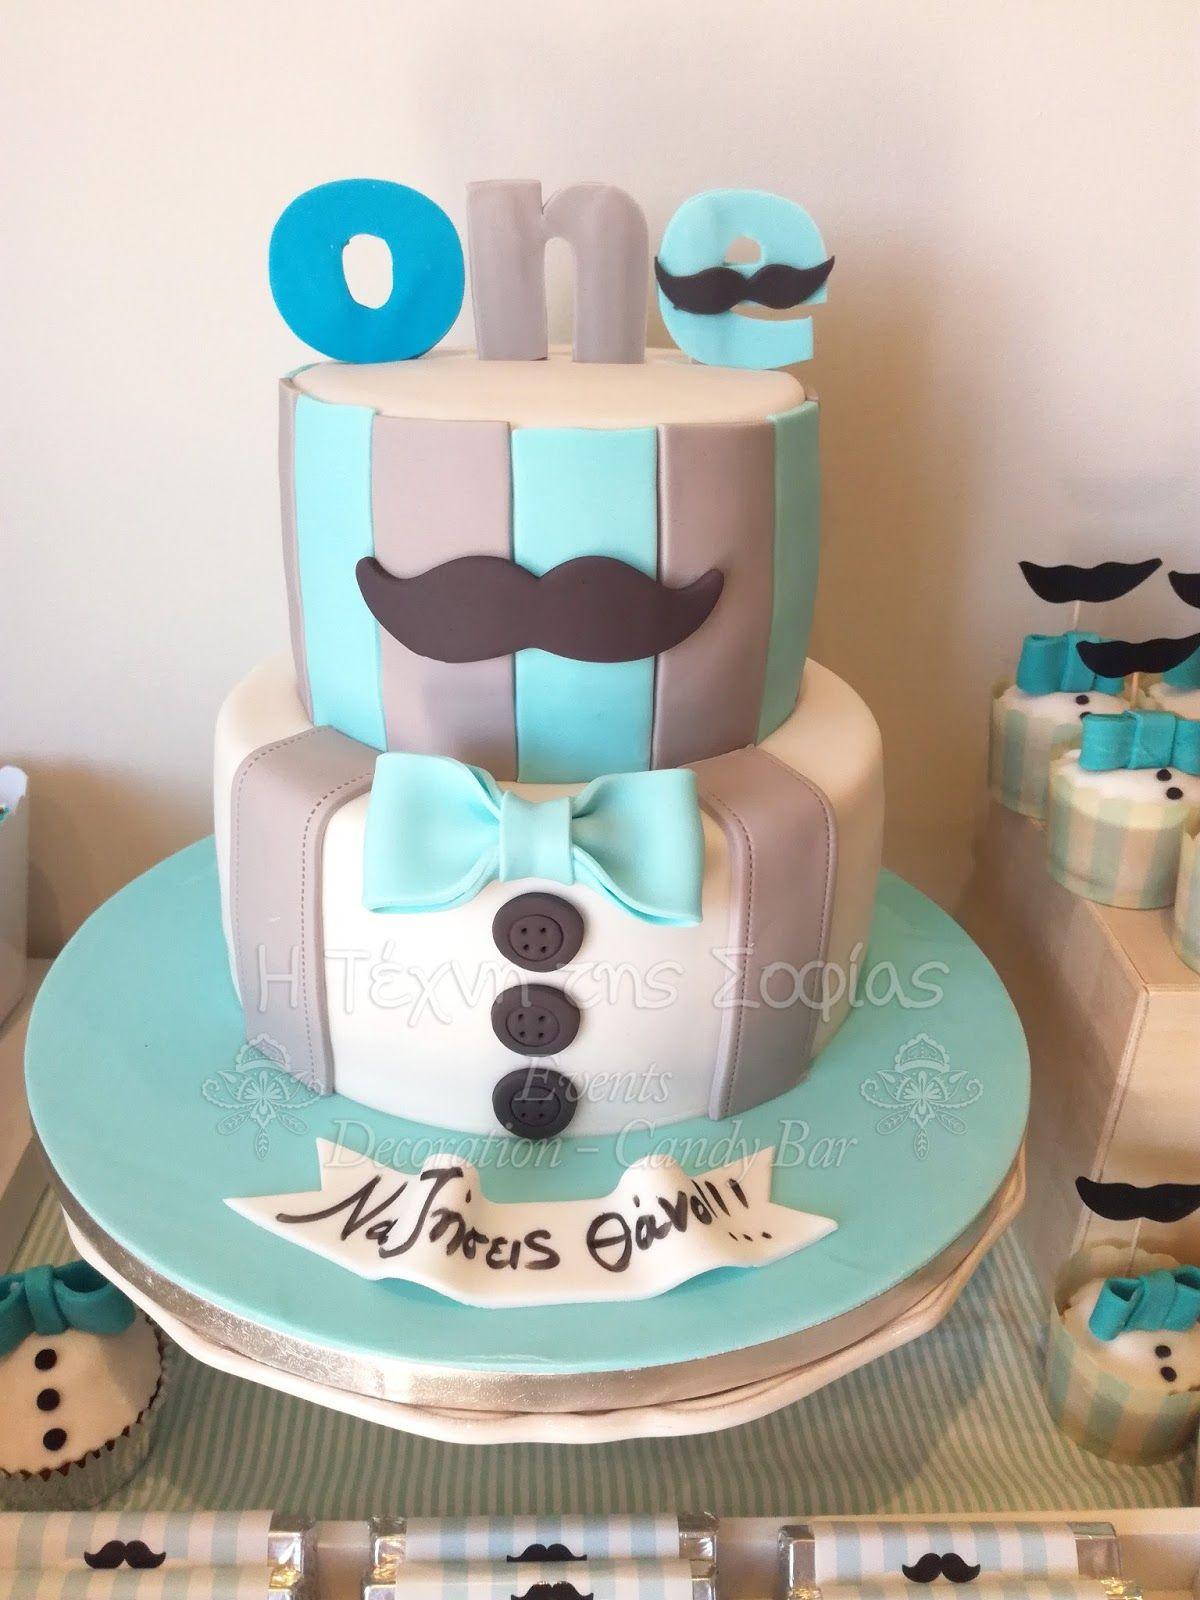 Little Man Party Pinterest Birthday Cakes Birthdays And Men Party